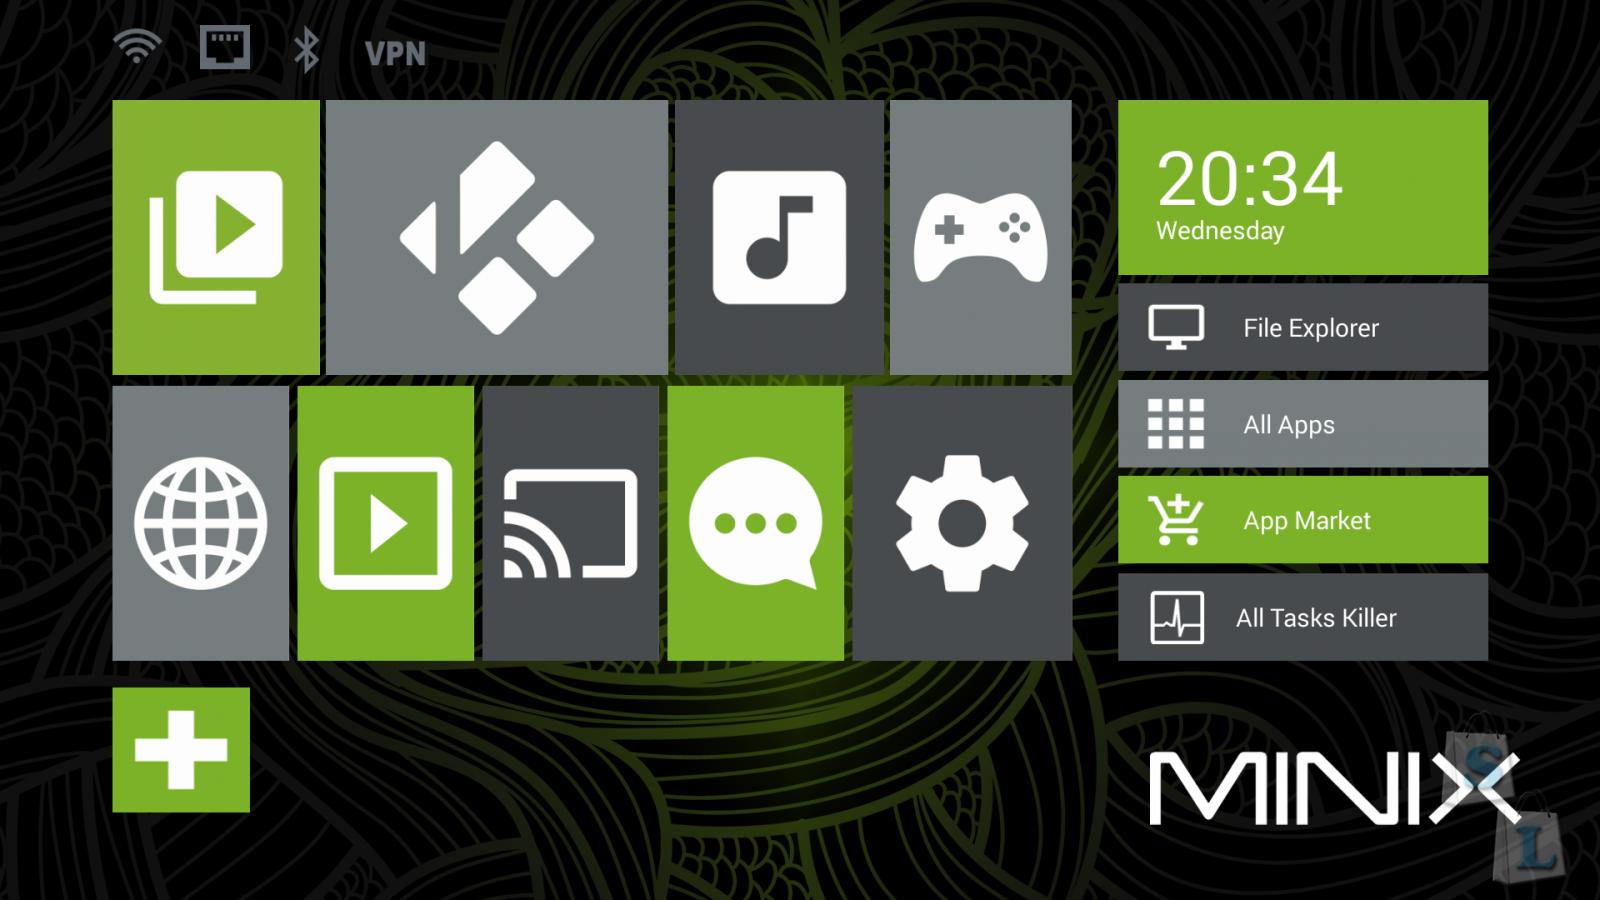 DealExtreme: MINIX NEO X6 Quad-Core Android - мультимедиа тв приставка с честным 1080P